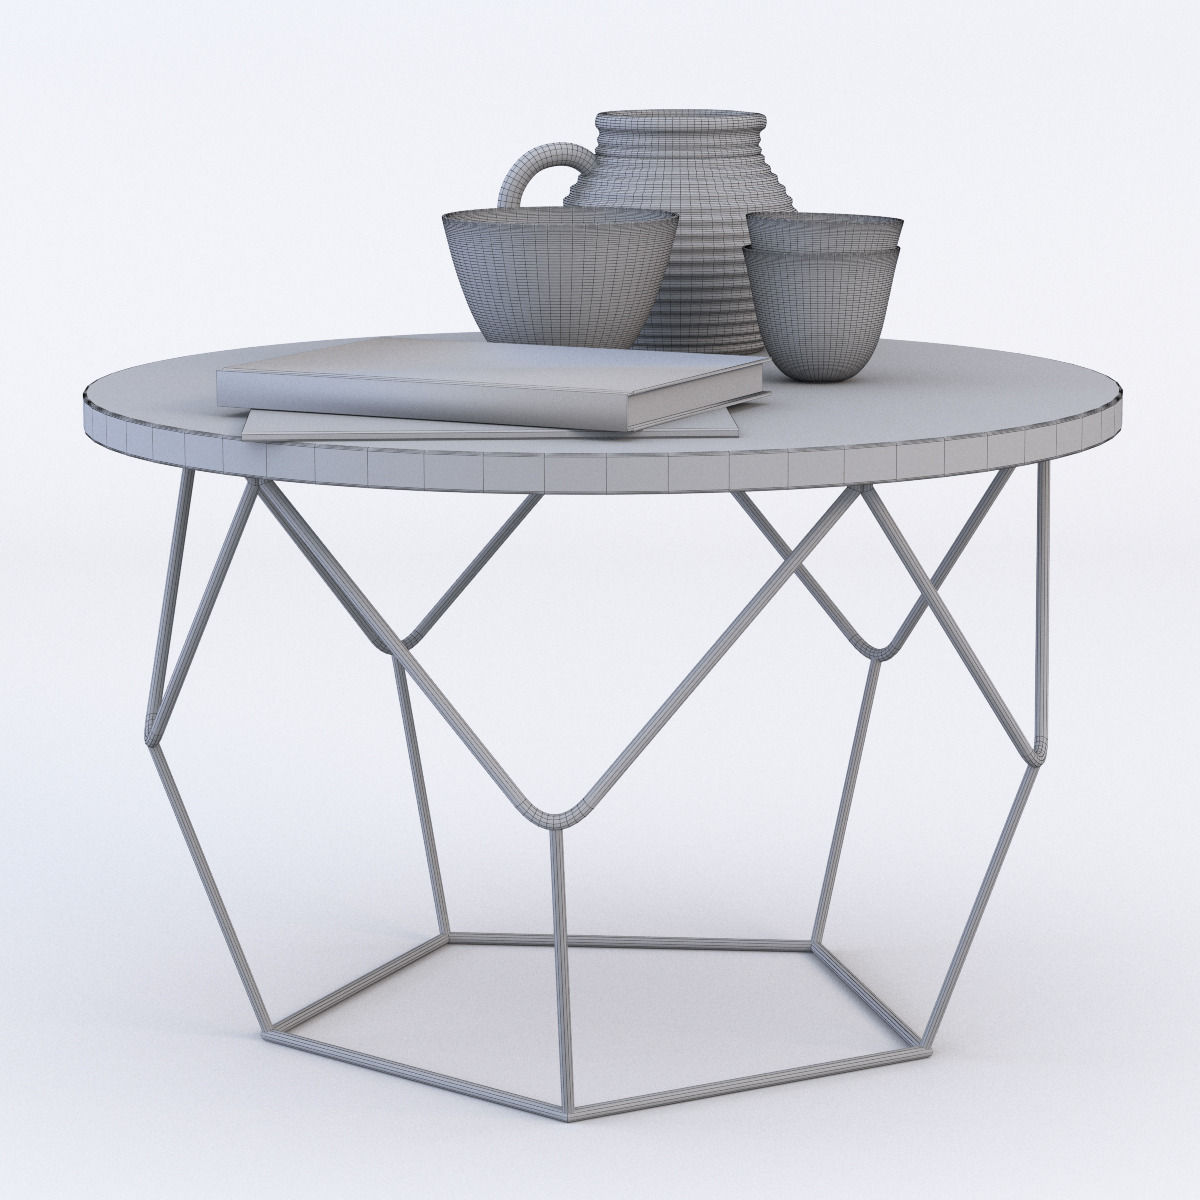 ... West Elm Origami Coffee Table 3d Model Max Obj Fbx Mtl 4 ...